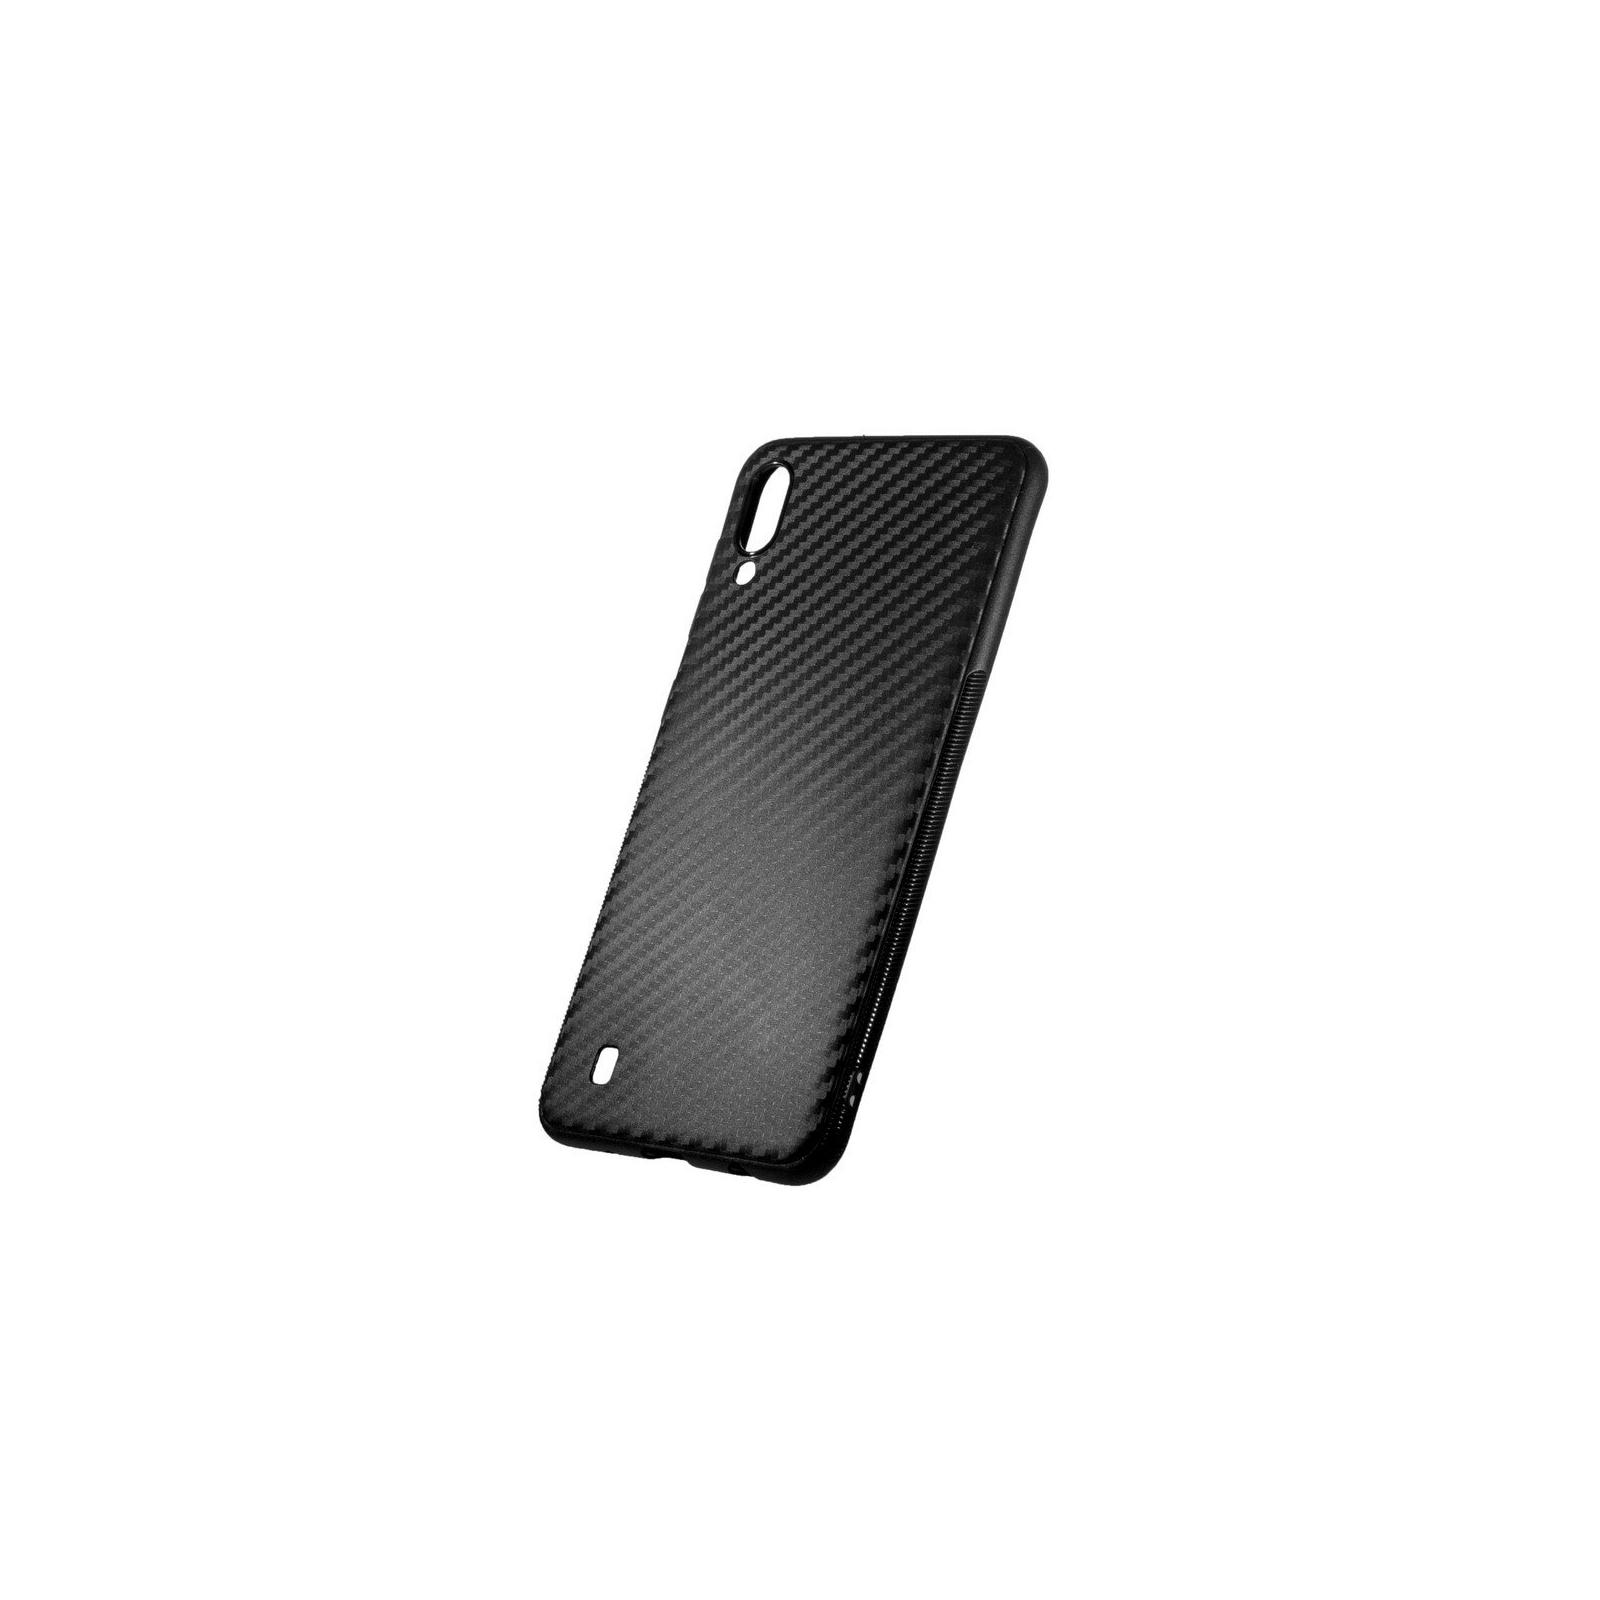 Чехол для моб. телефона ColorWay ColorWay TPU Сarbon для Samsung Galaxy M10 Black (CW-CTCBSGM105-BK) изображение 2